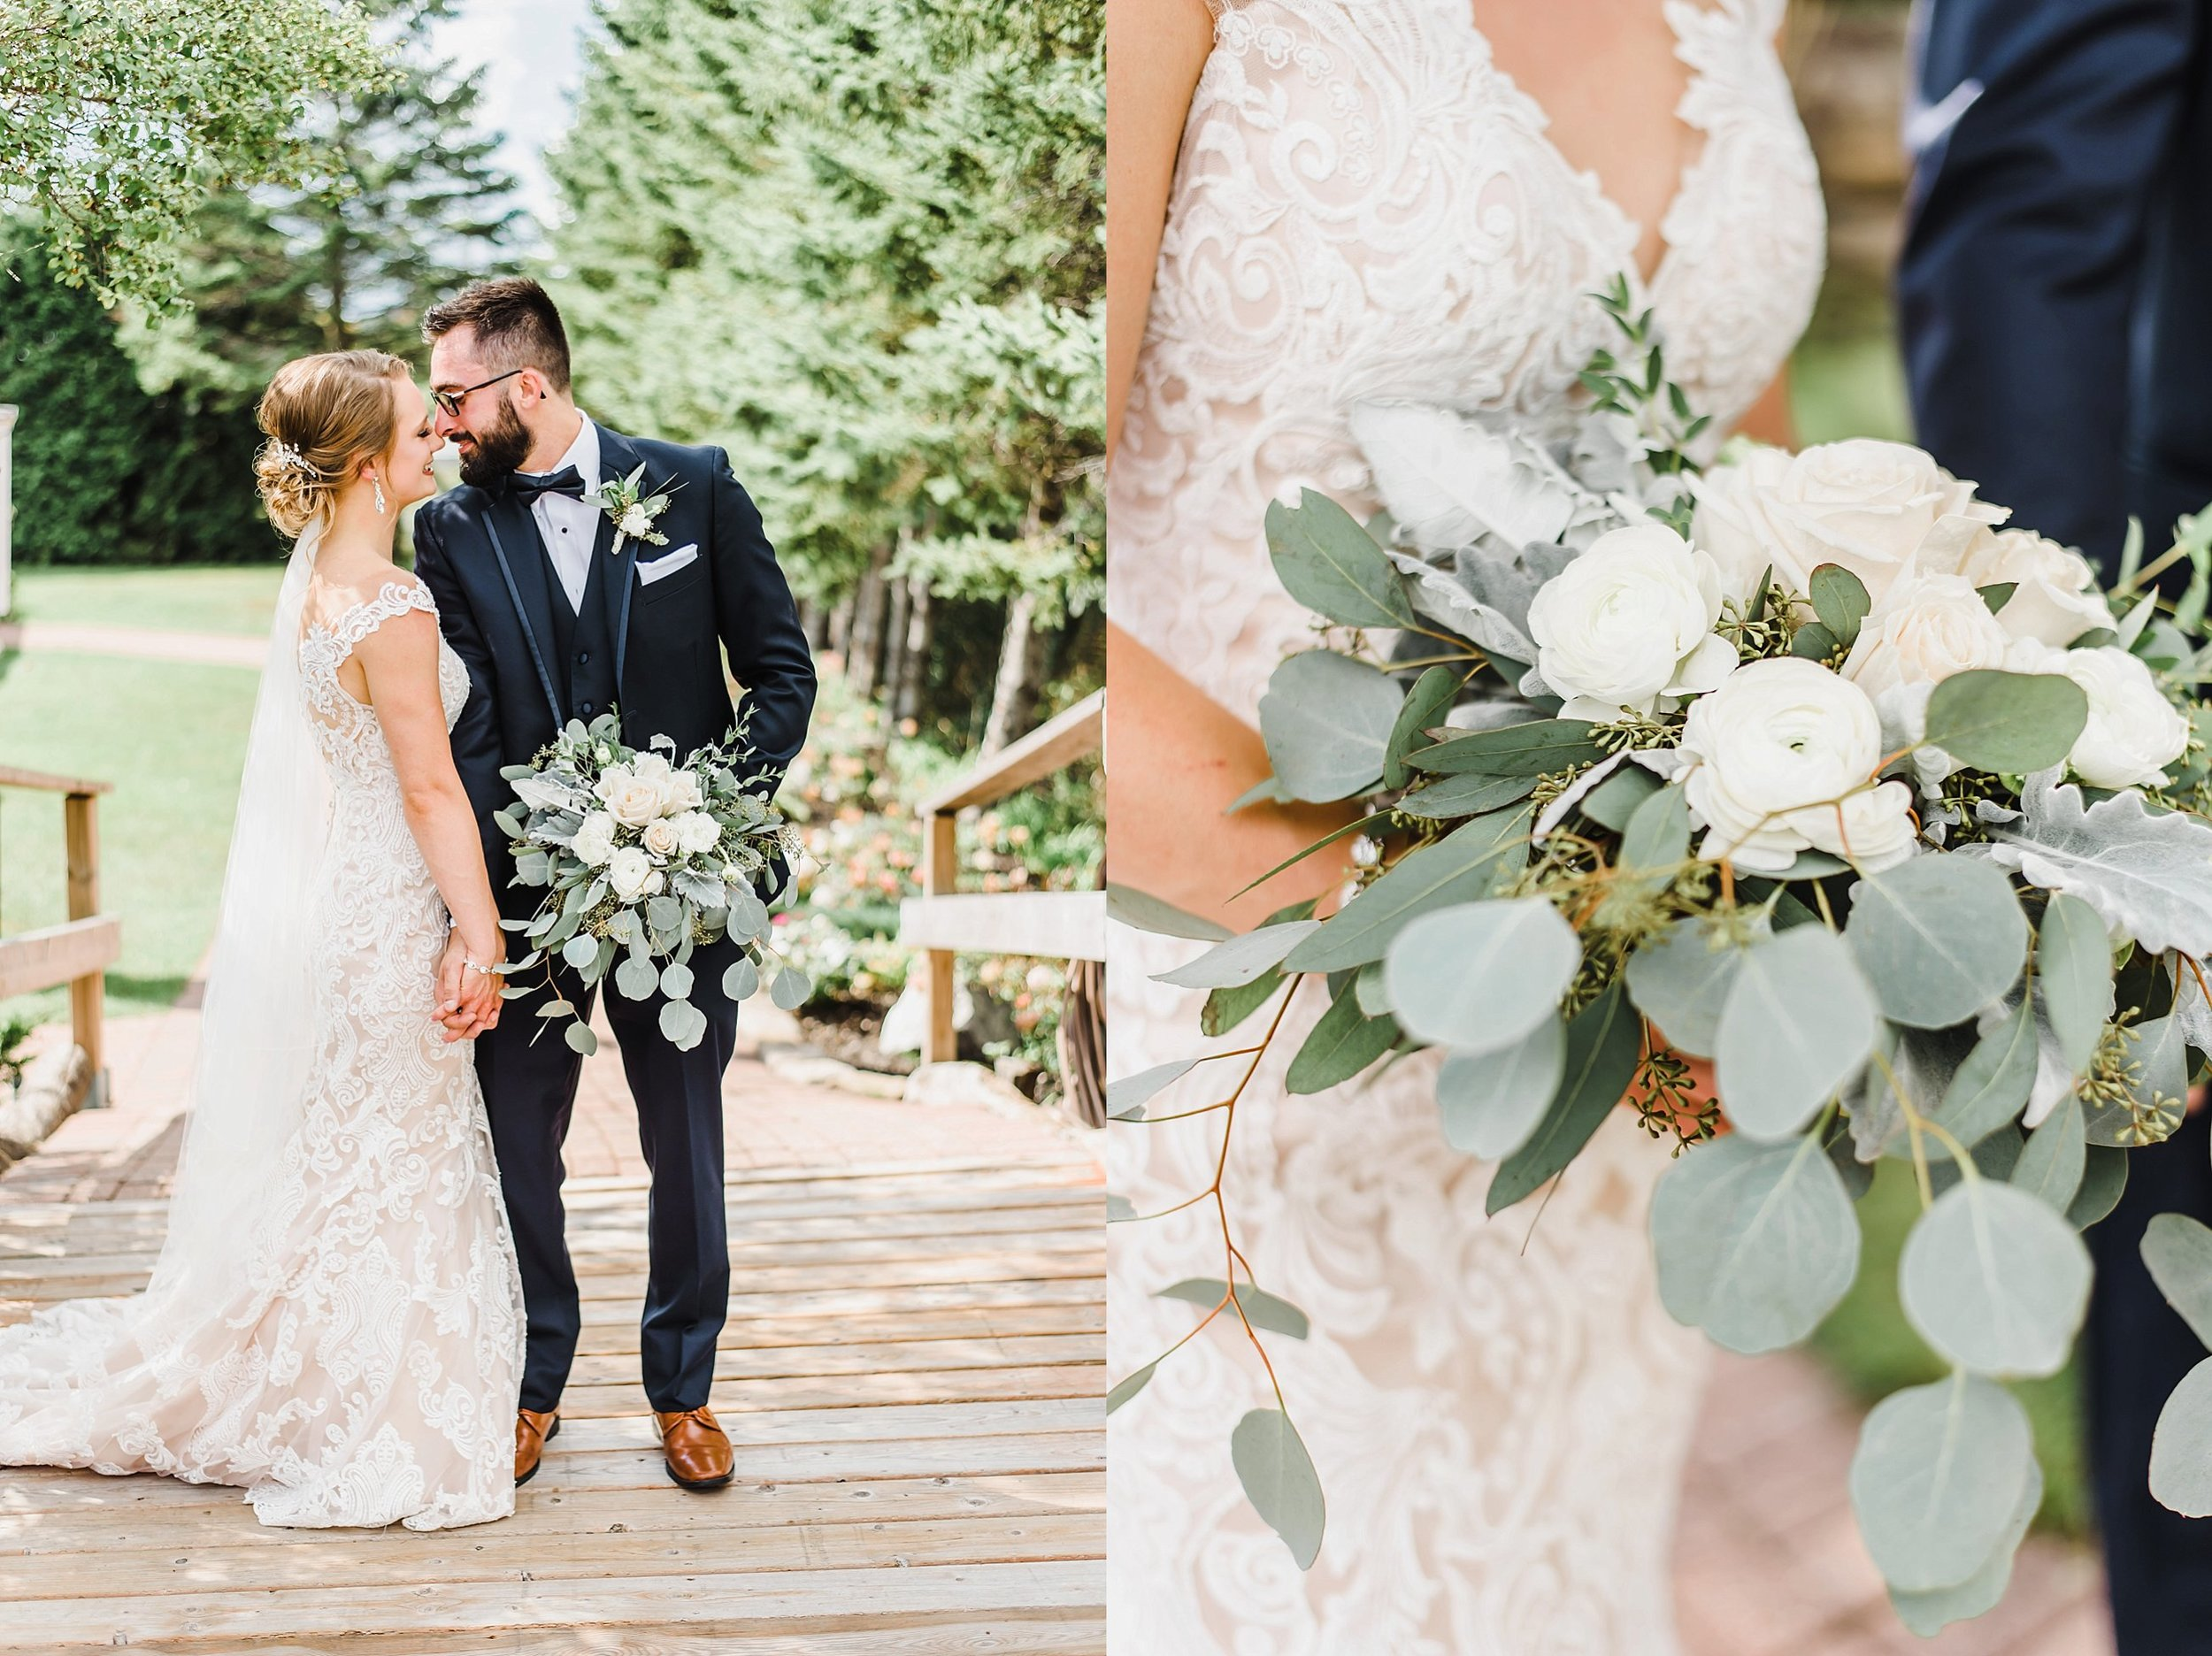 light airy indie fine art ottawa wedding photographer | Ali and Batoul Photography_1256.jpg